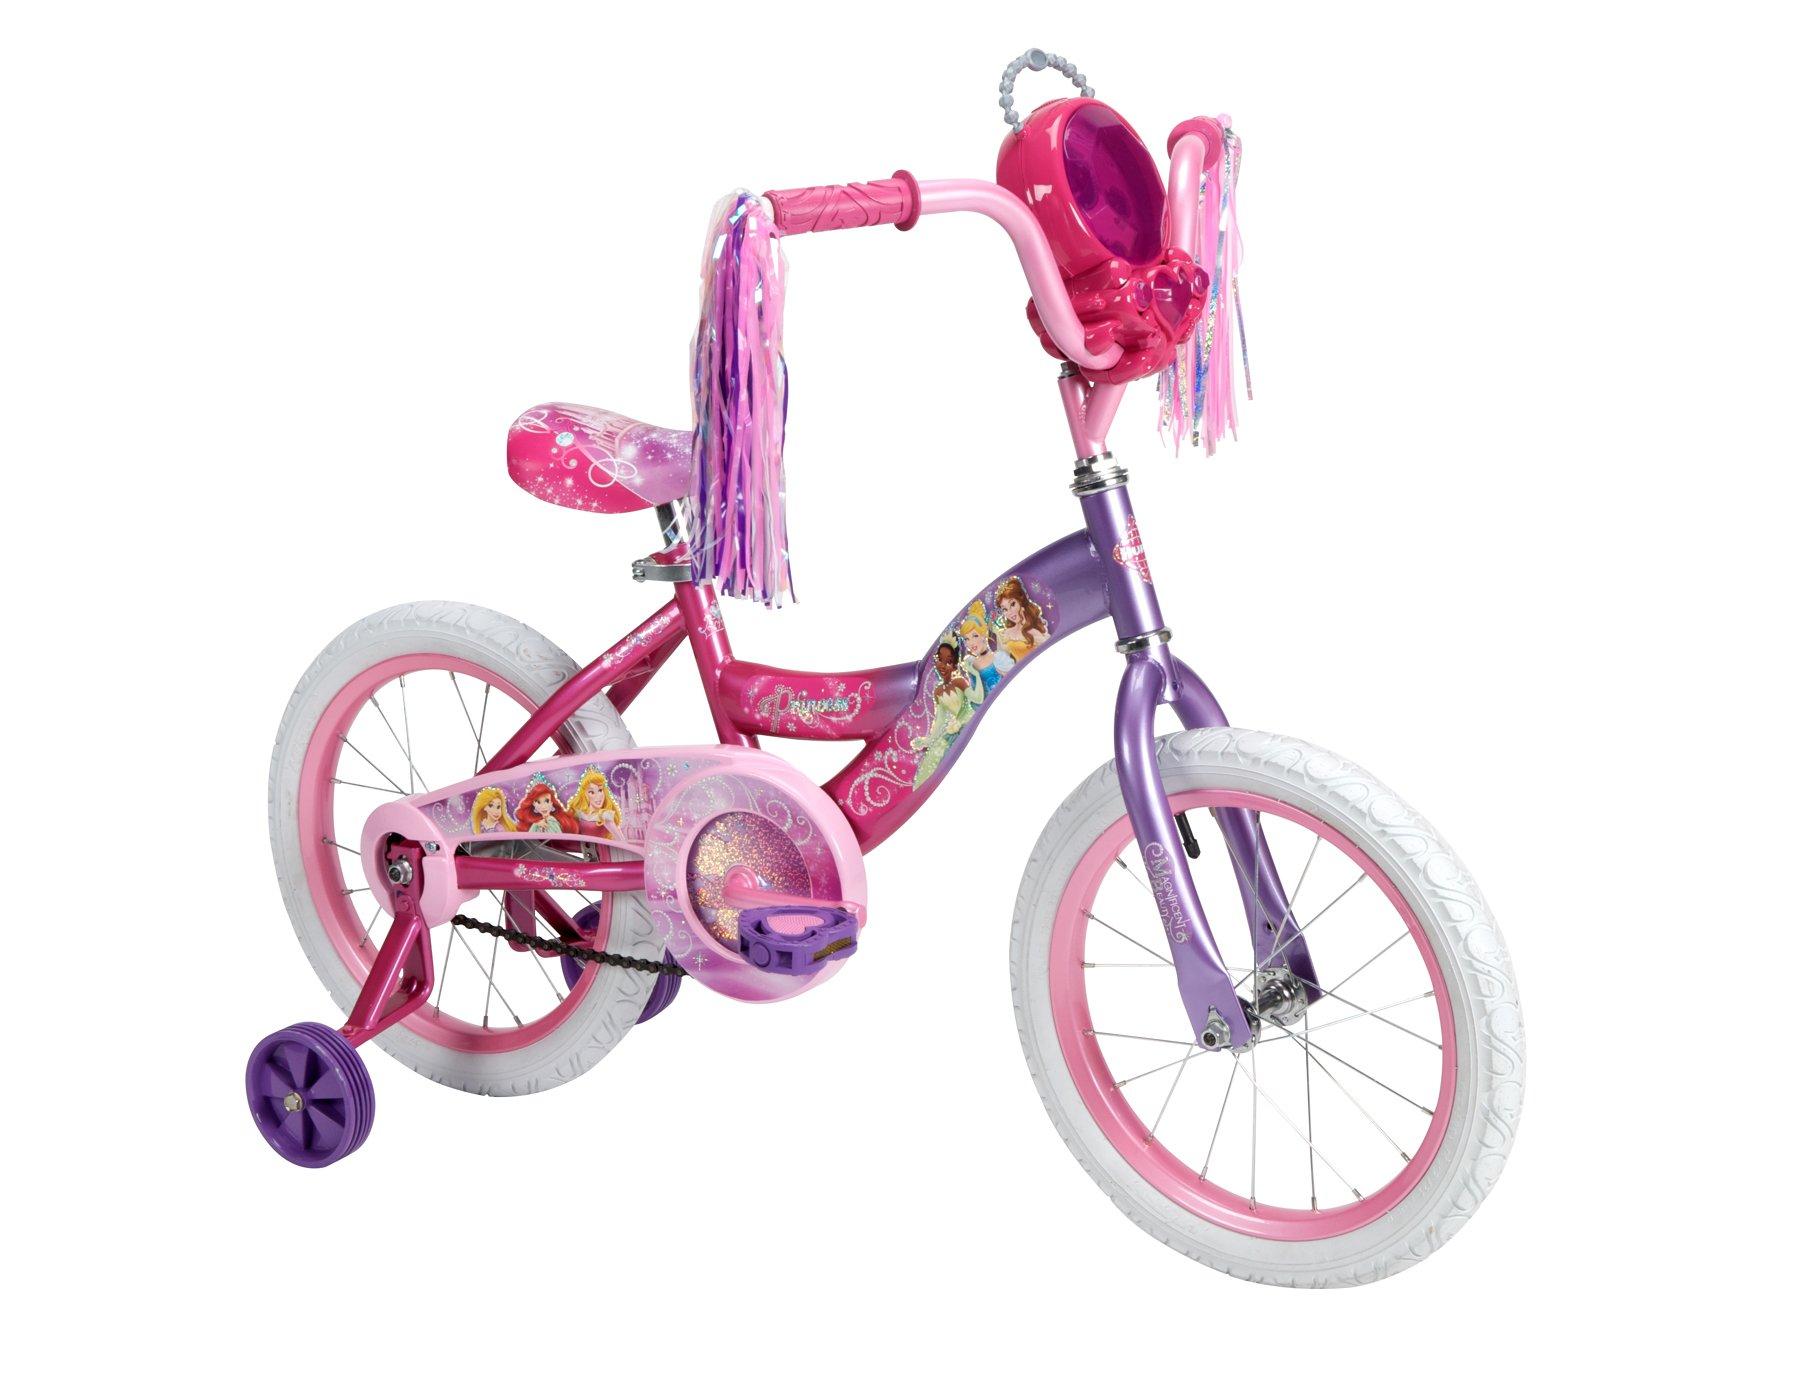 Huffy Bicycle Company Number 21975 Disney Princess Bike